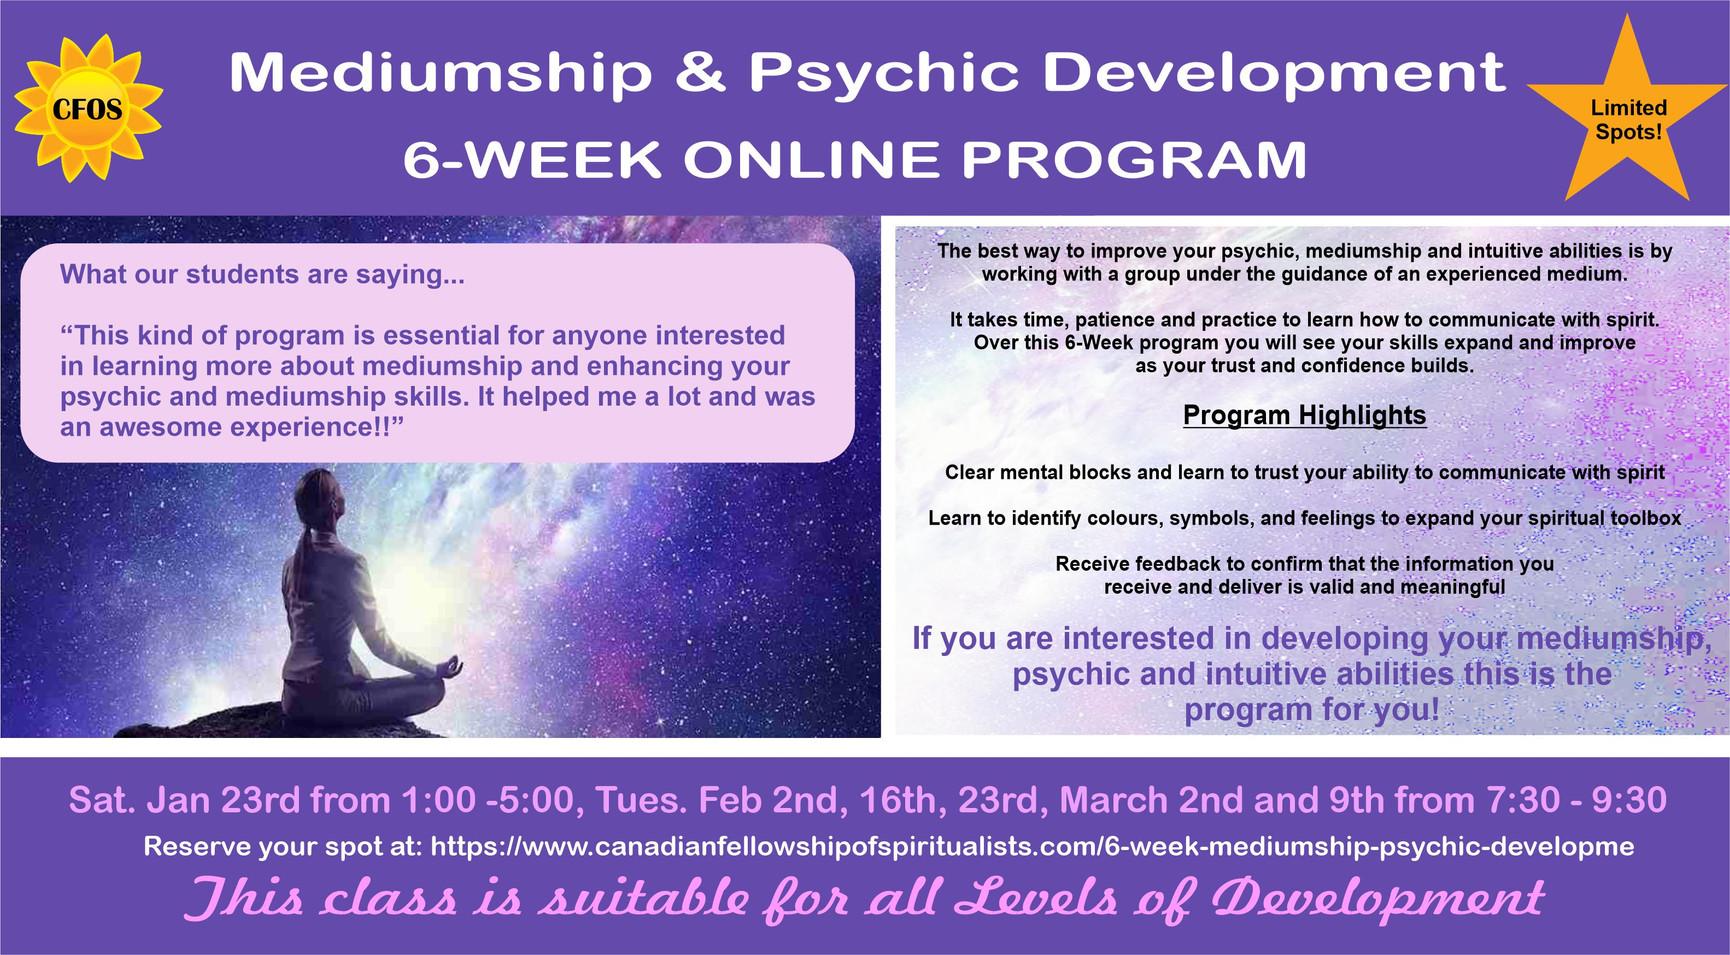 6 week Mediumship & Pyshic Development program